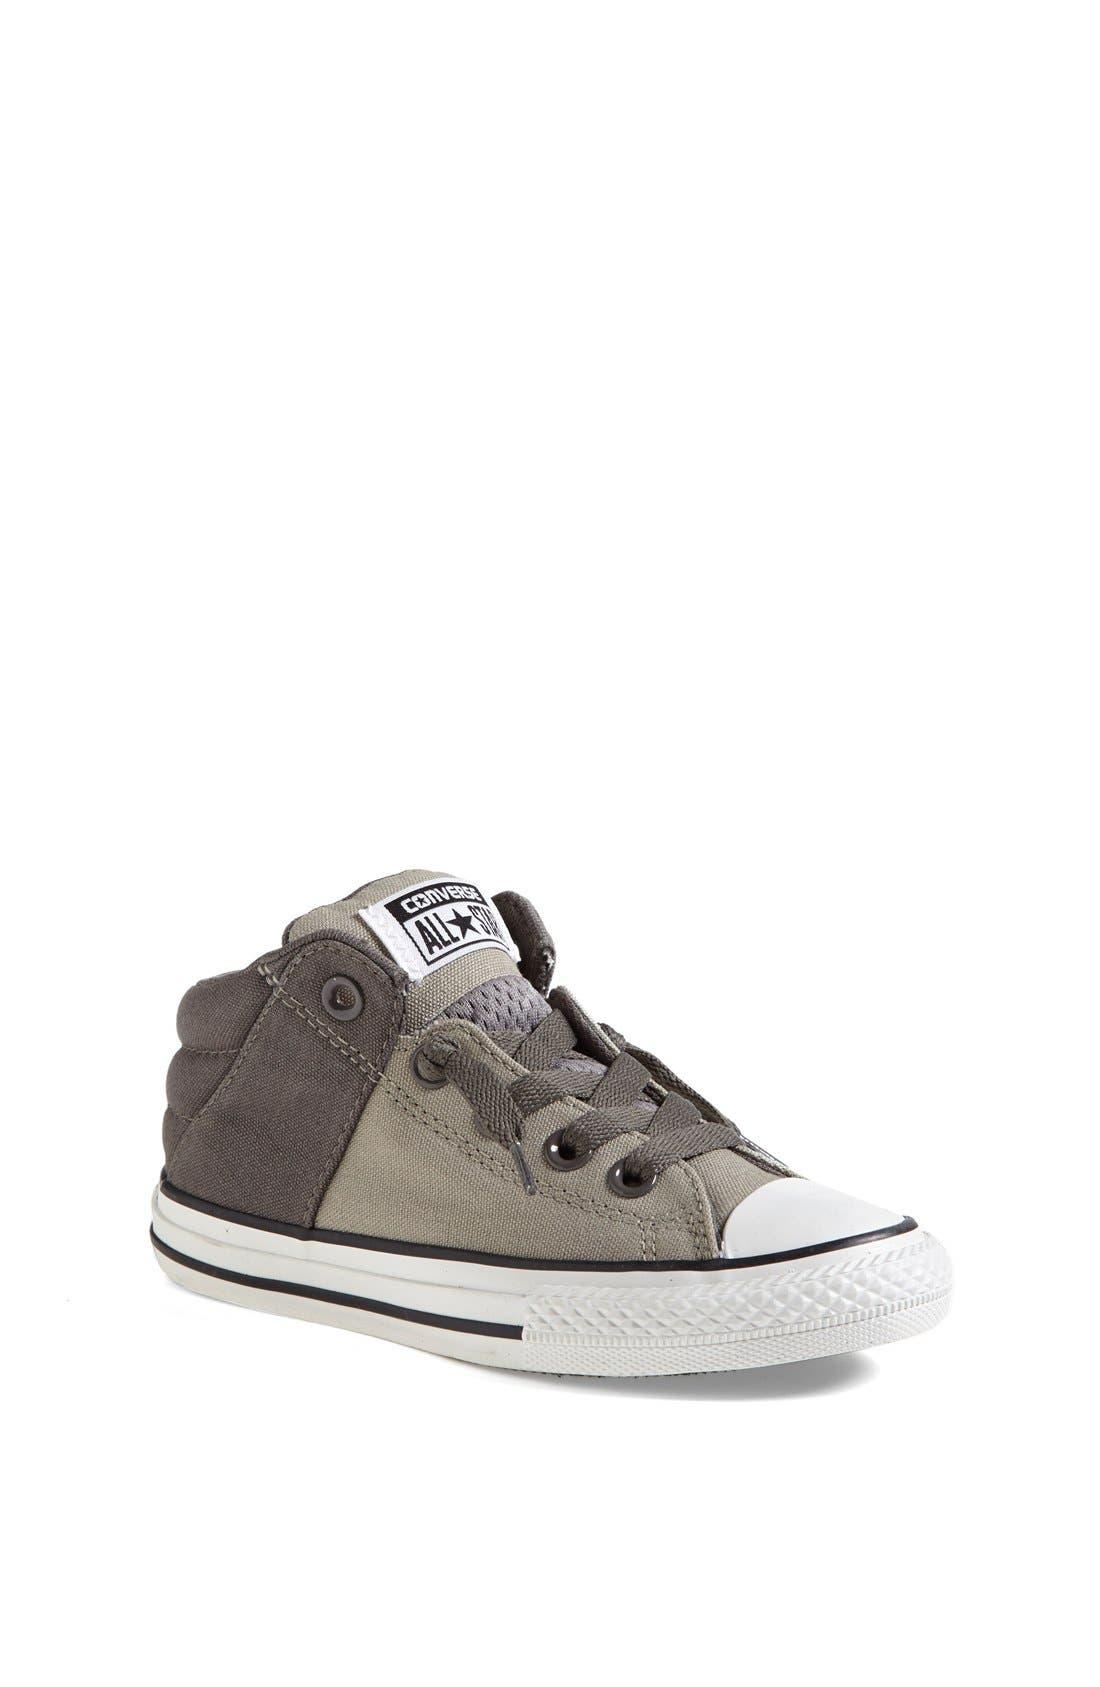 Main Image - Converse Chuck Taylor® All-Star® 'Axel' Sneaker (Toddler, Little Kid & Big Kid)